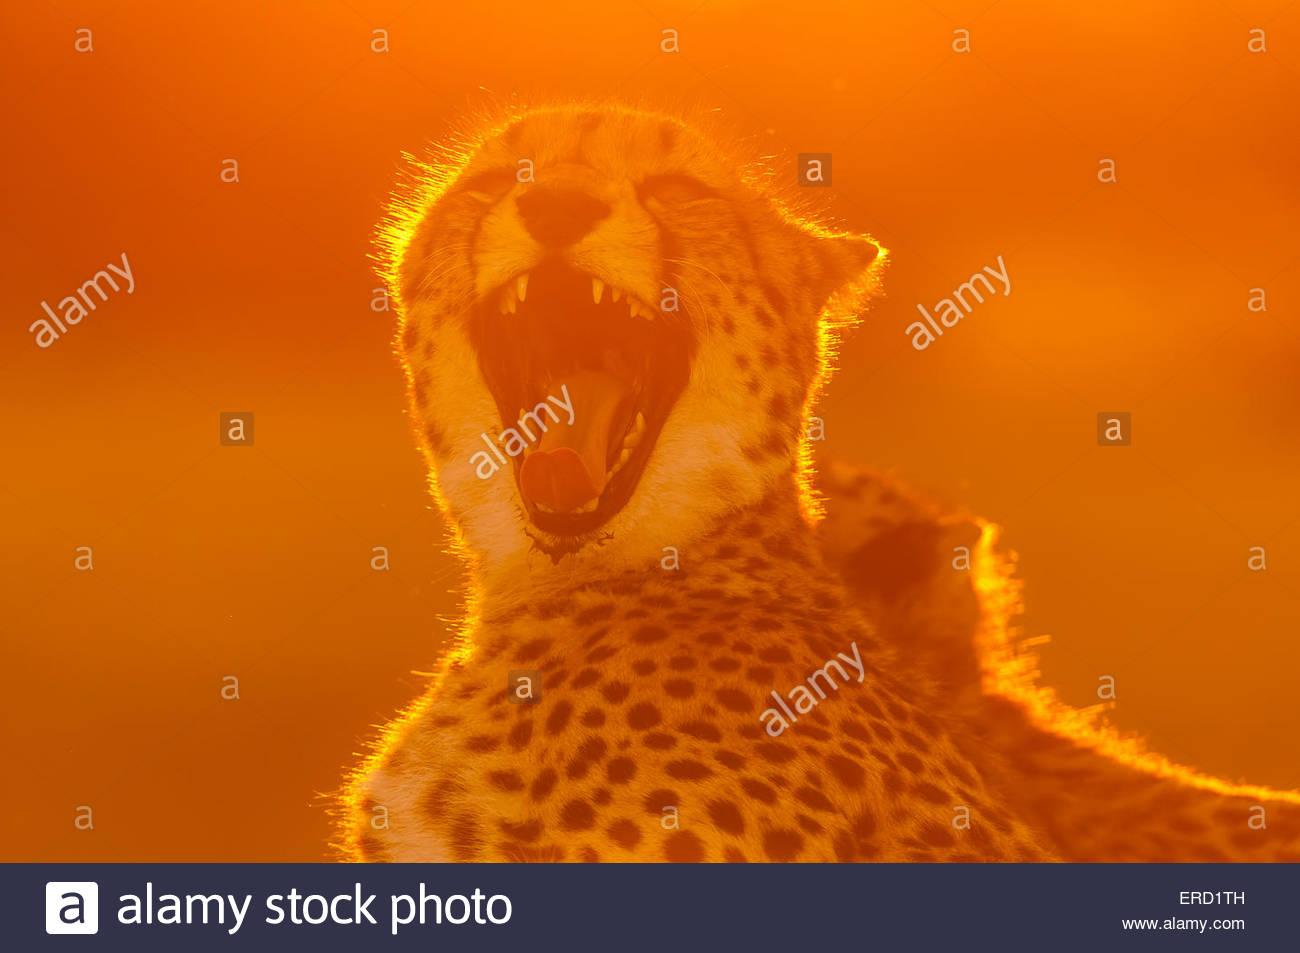 A cheetah yawning, Okavango Delta, Botswana. - Stock Image